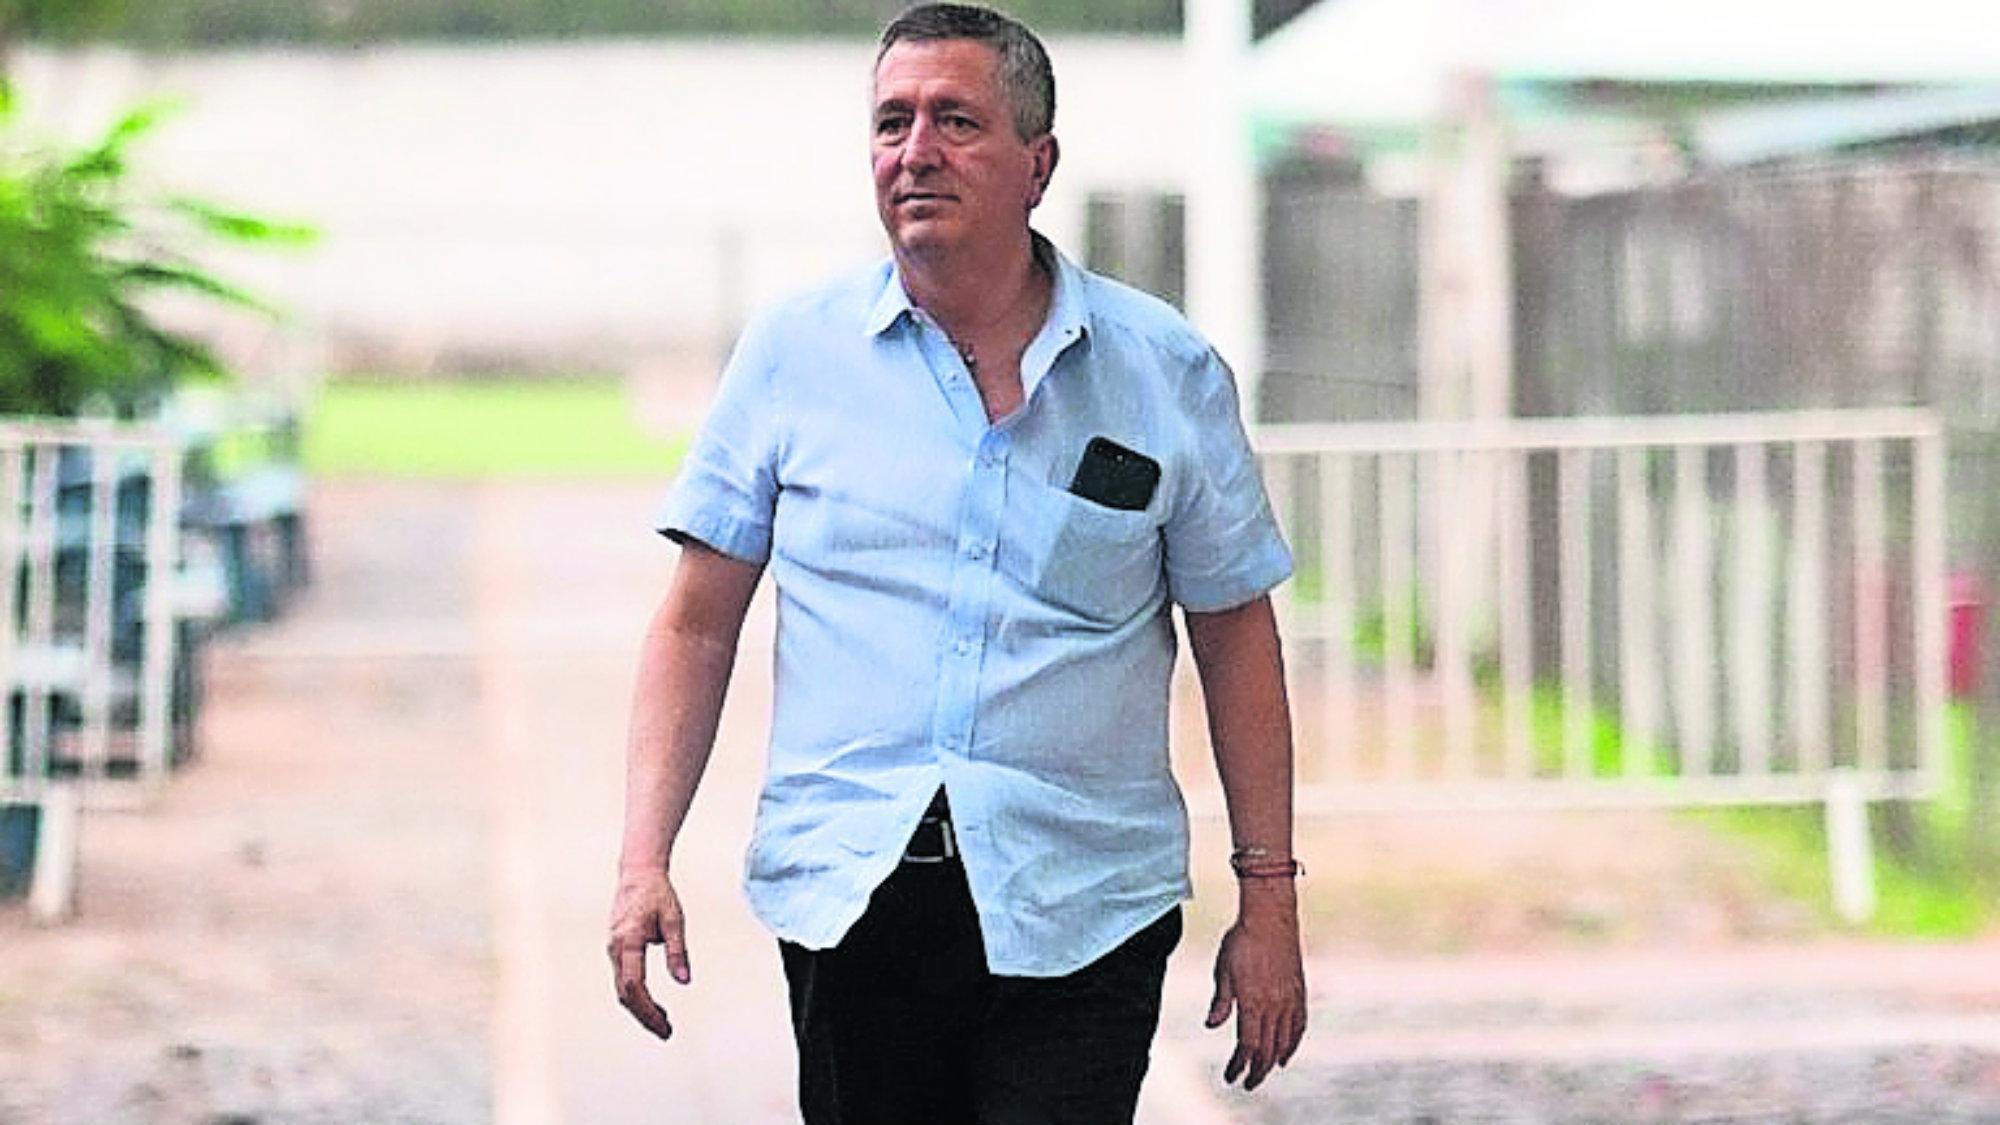 Jorge Vergara, dueño de chivas, esta vivo, no esta muerto, demandará